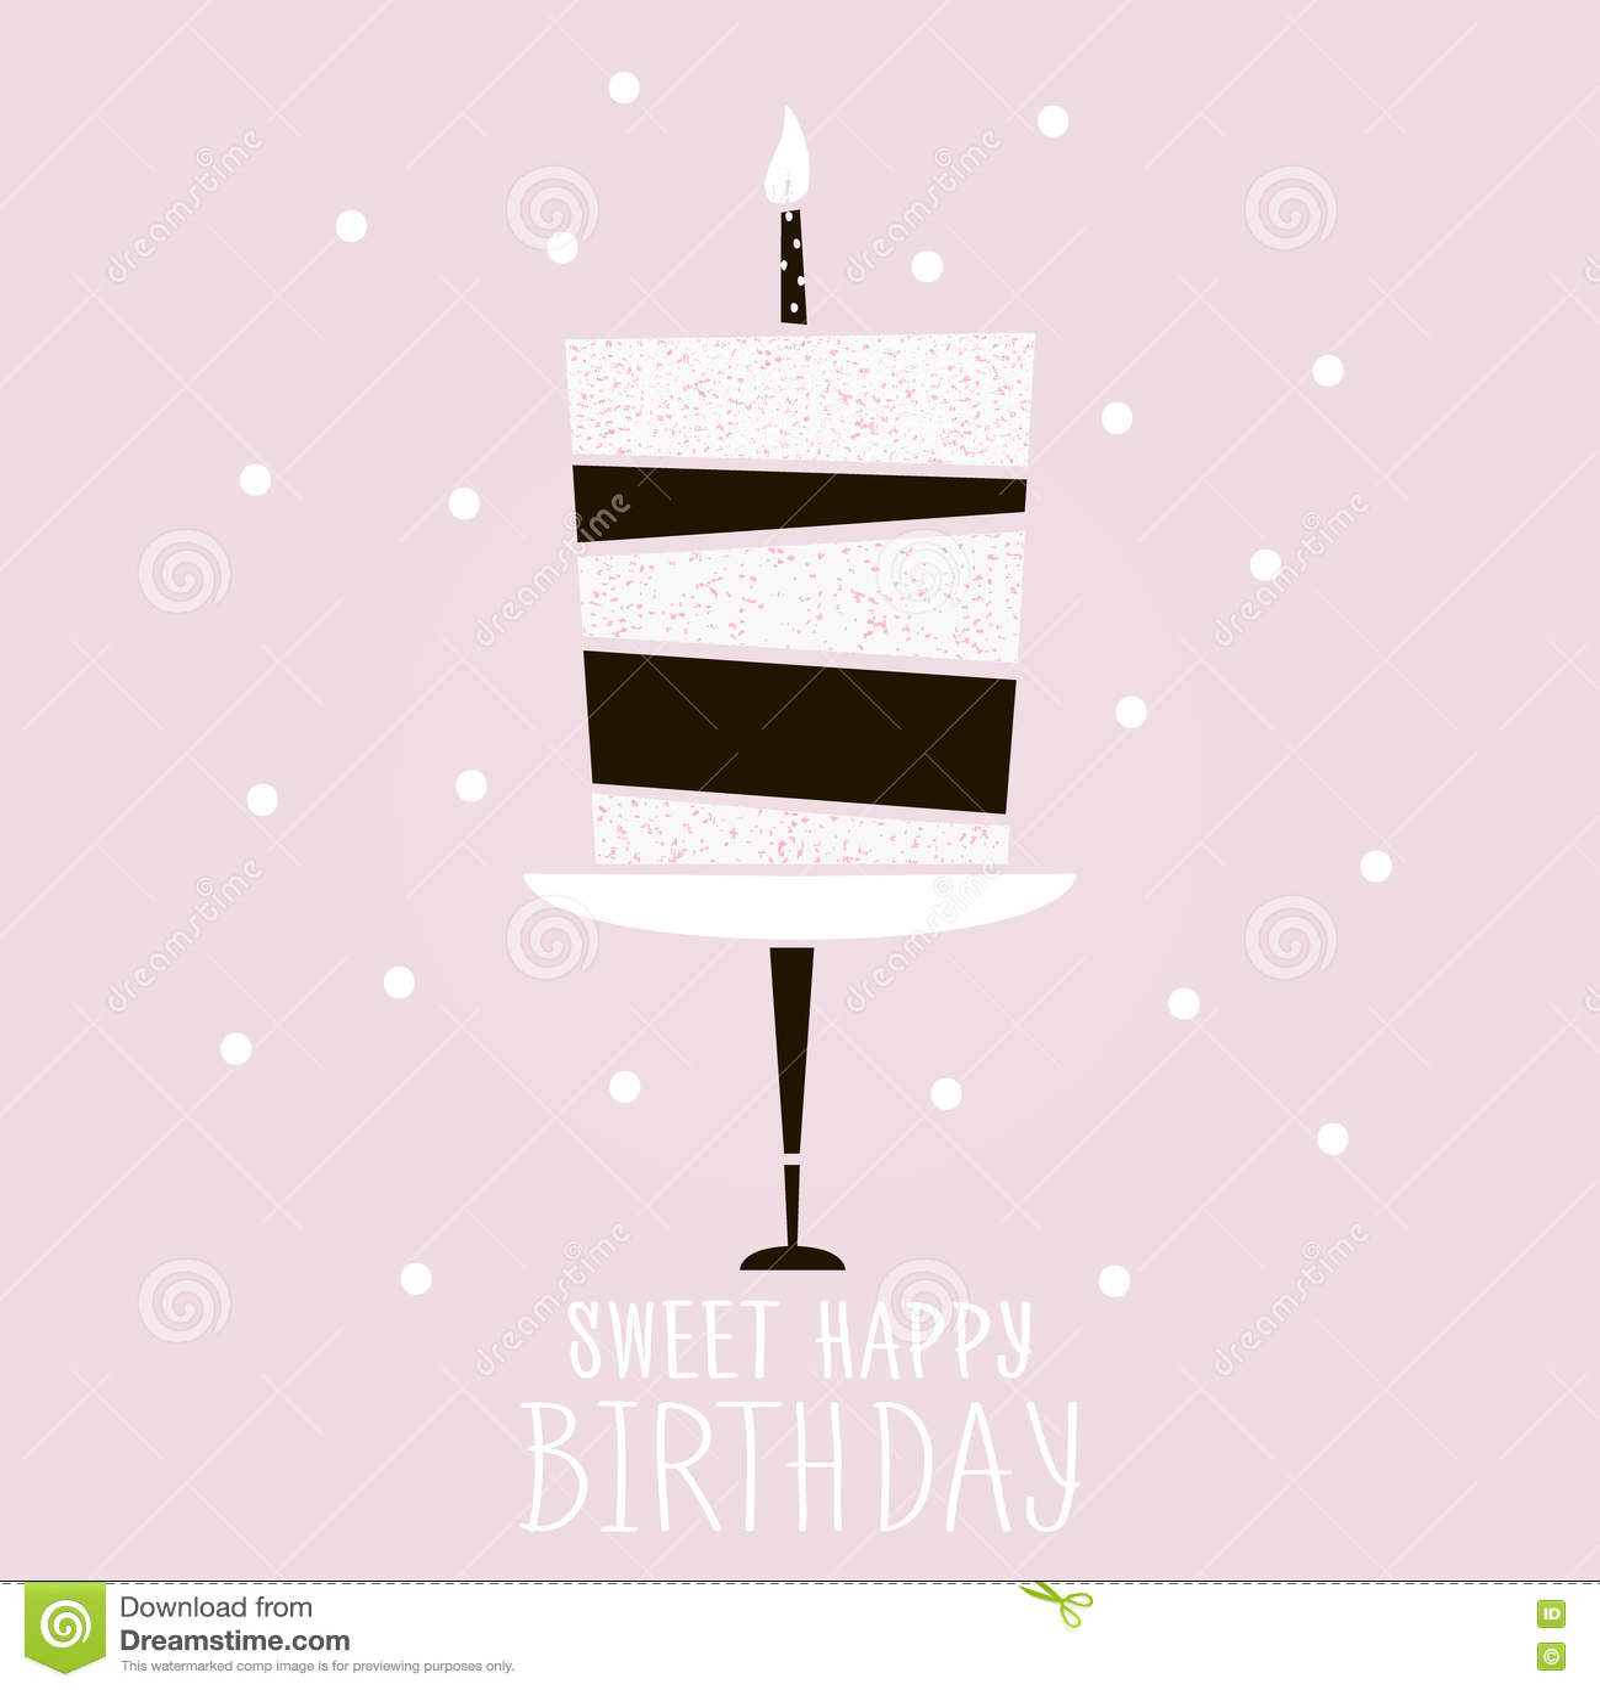 Cute Cake With Happy Birthday Wish Modern Greeting Card Template – Birthday Wish Template